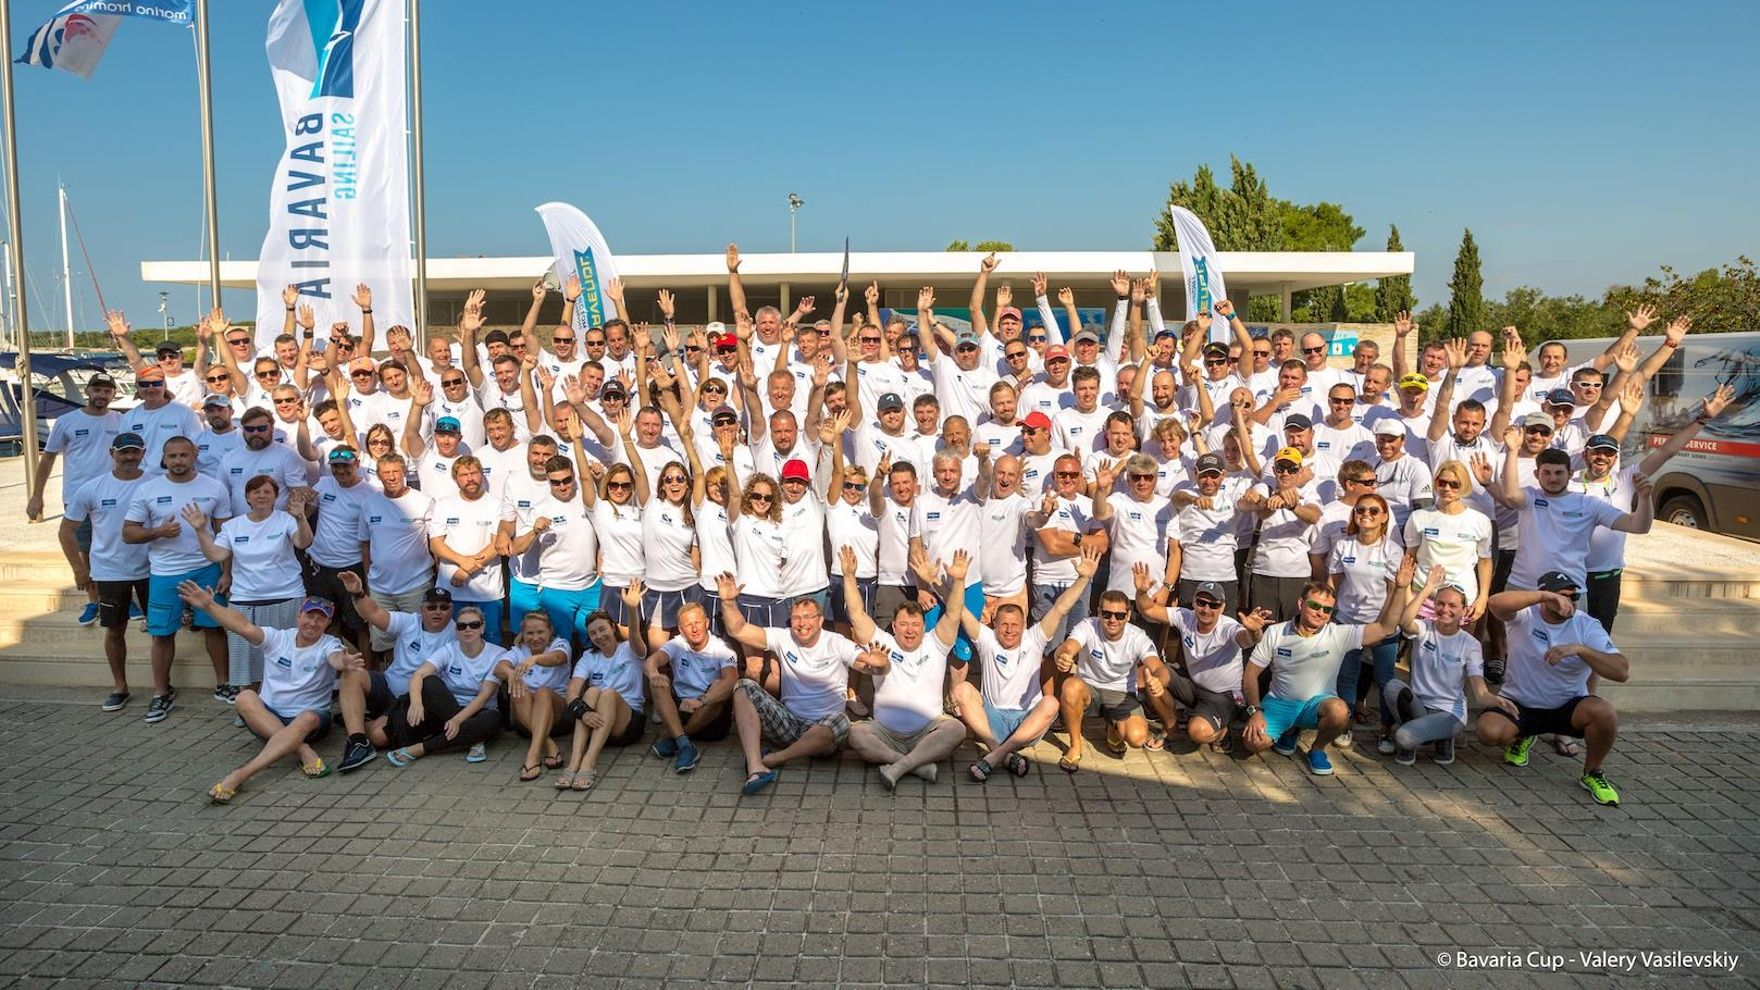 Bavaria Cup 2020